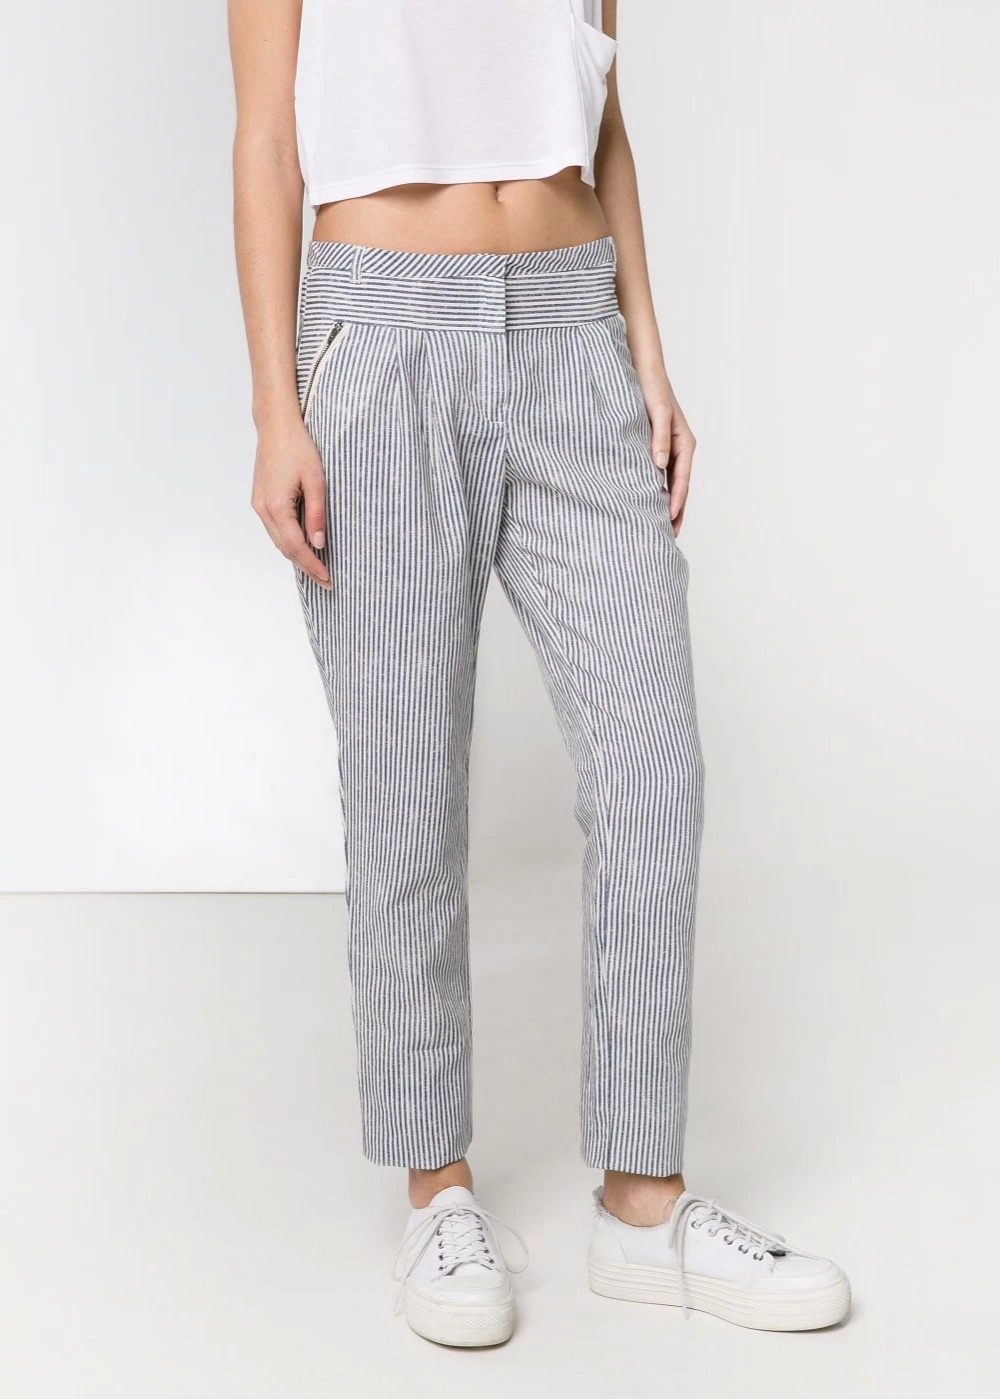 03LJ01 Fashion women's Elegant stripe cotton linen suit ...